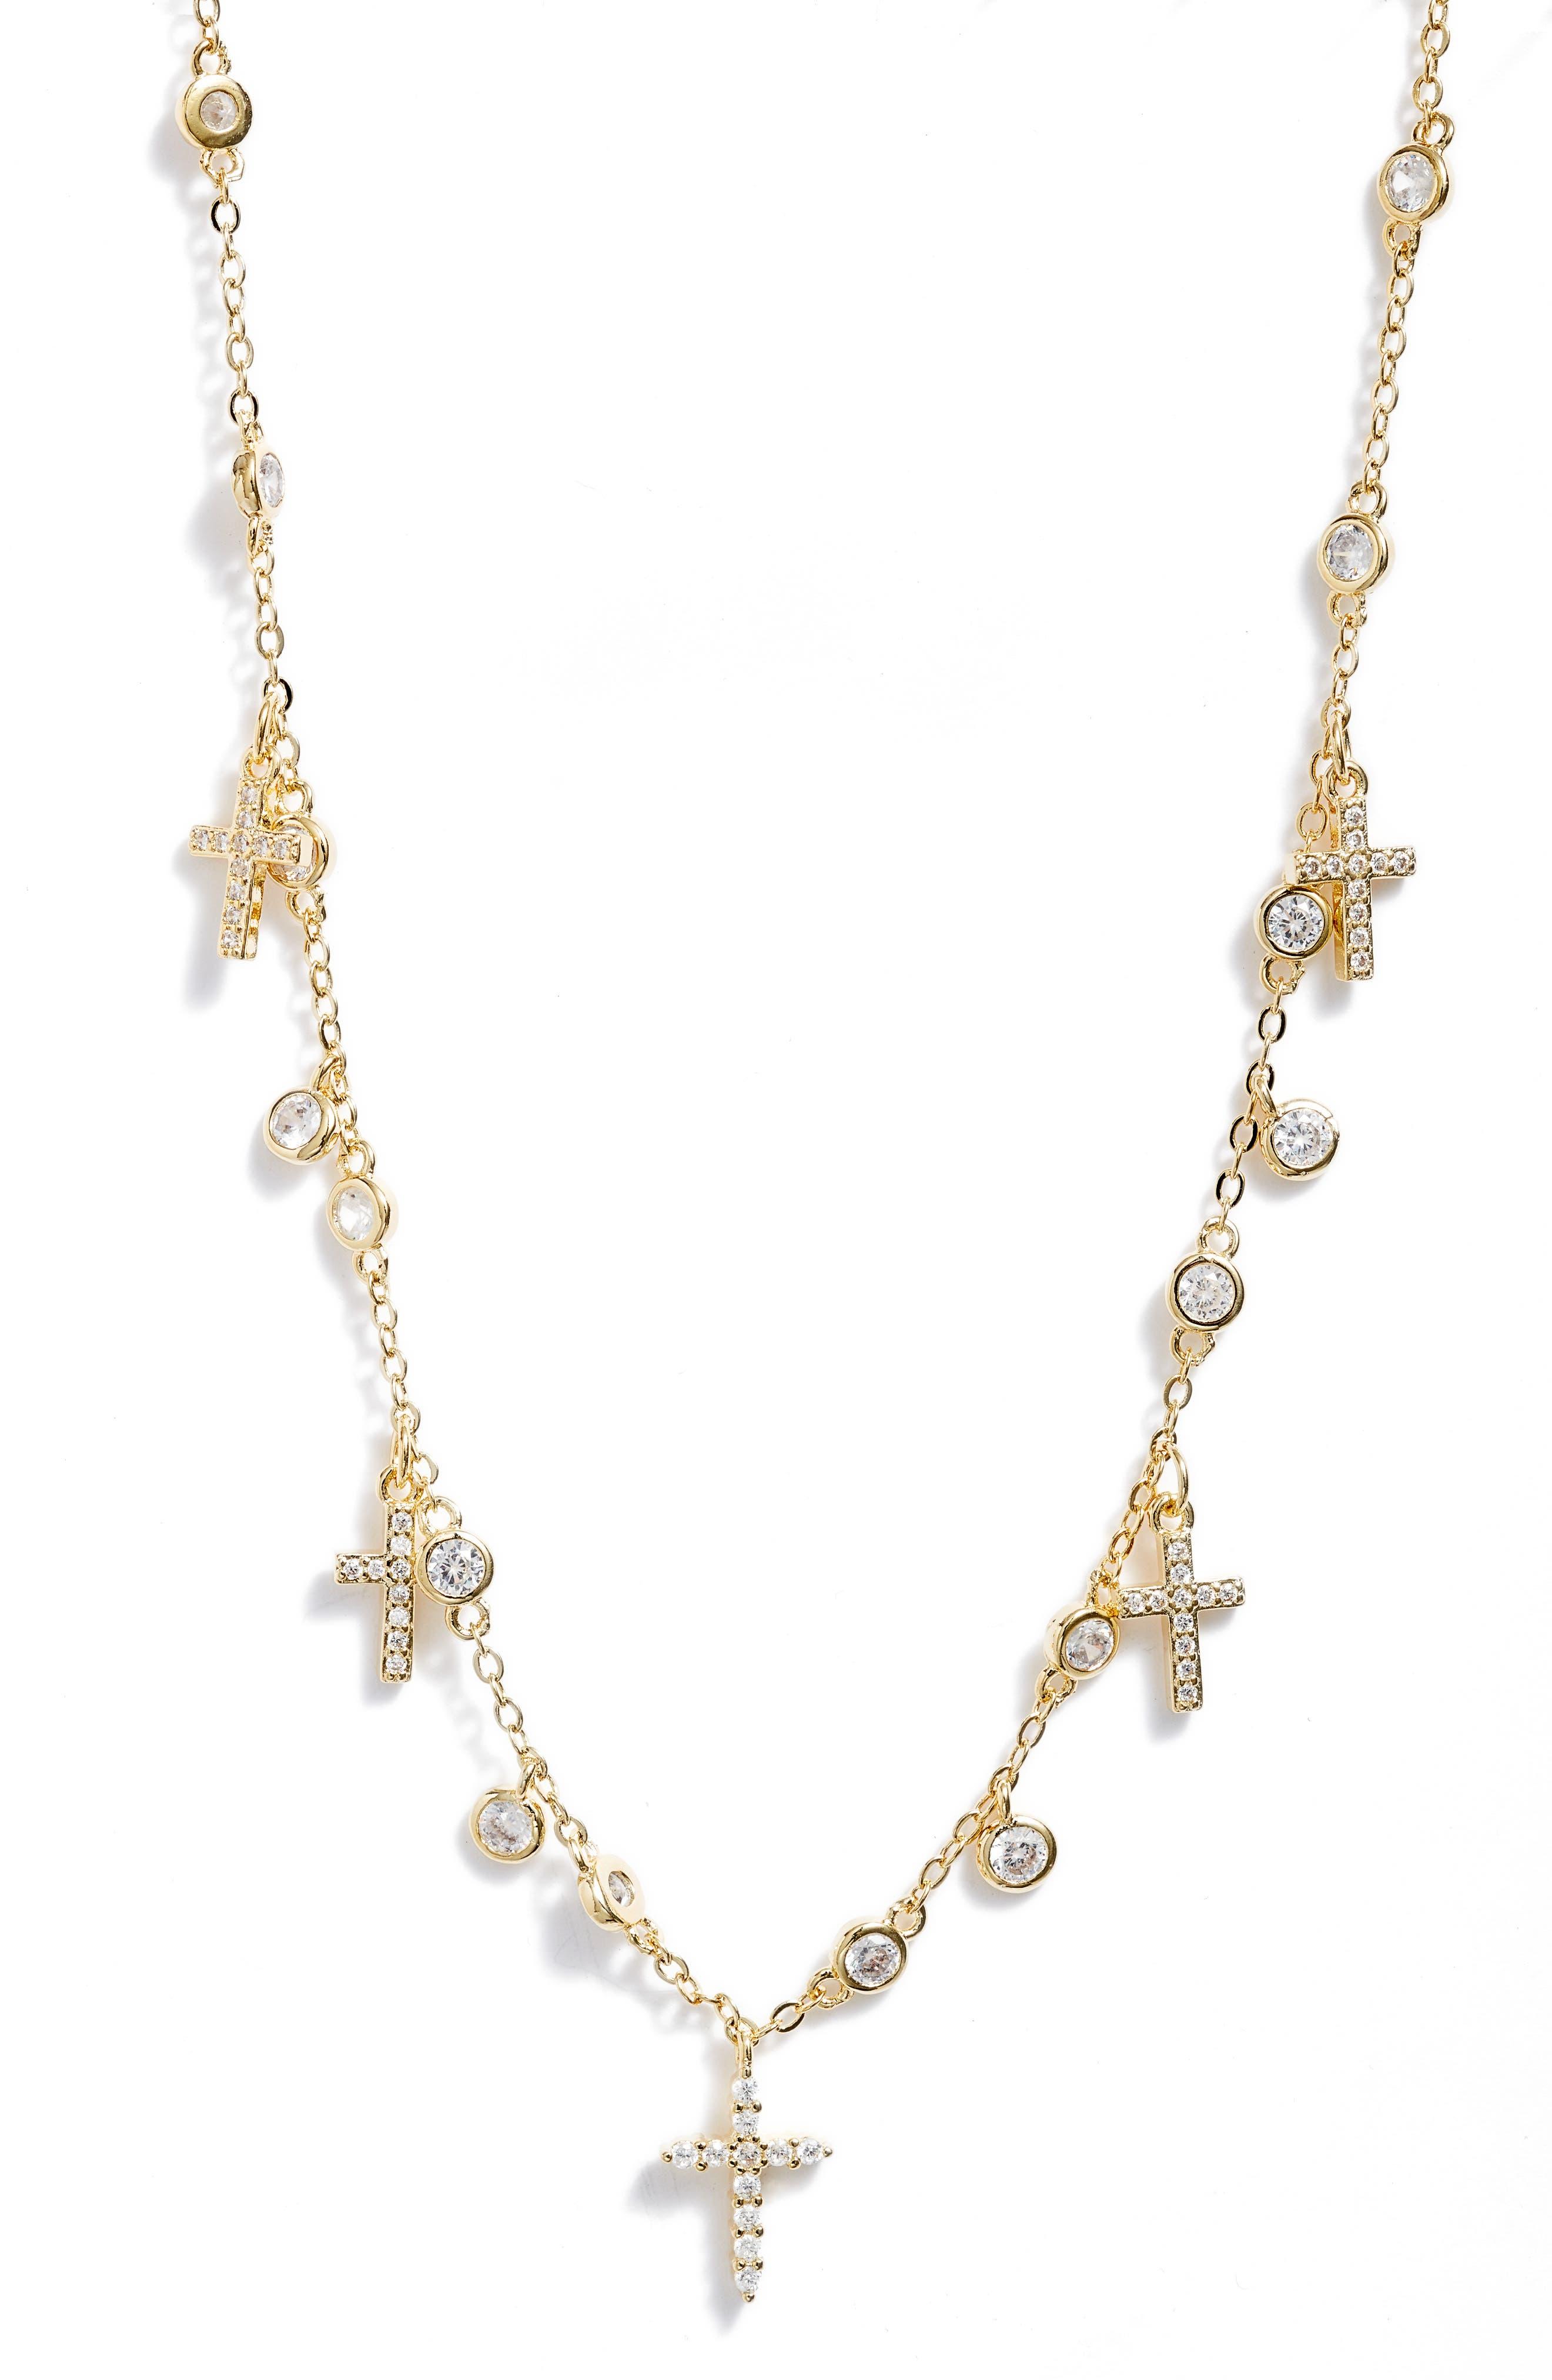 Abundant Pendant Necklace